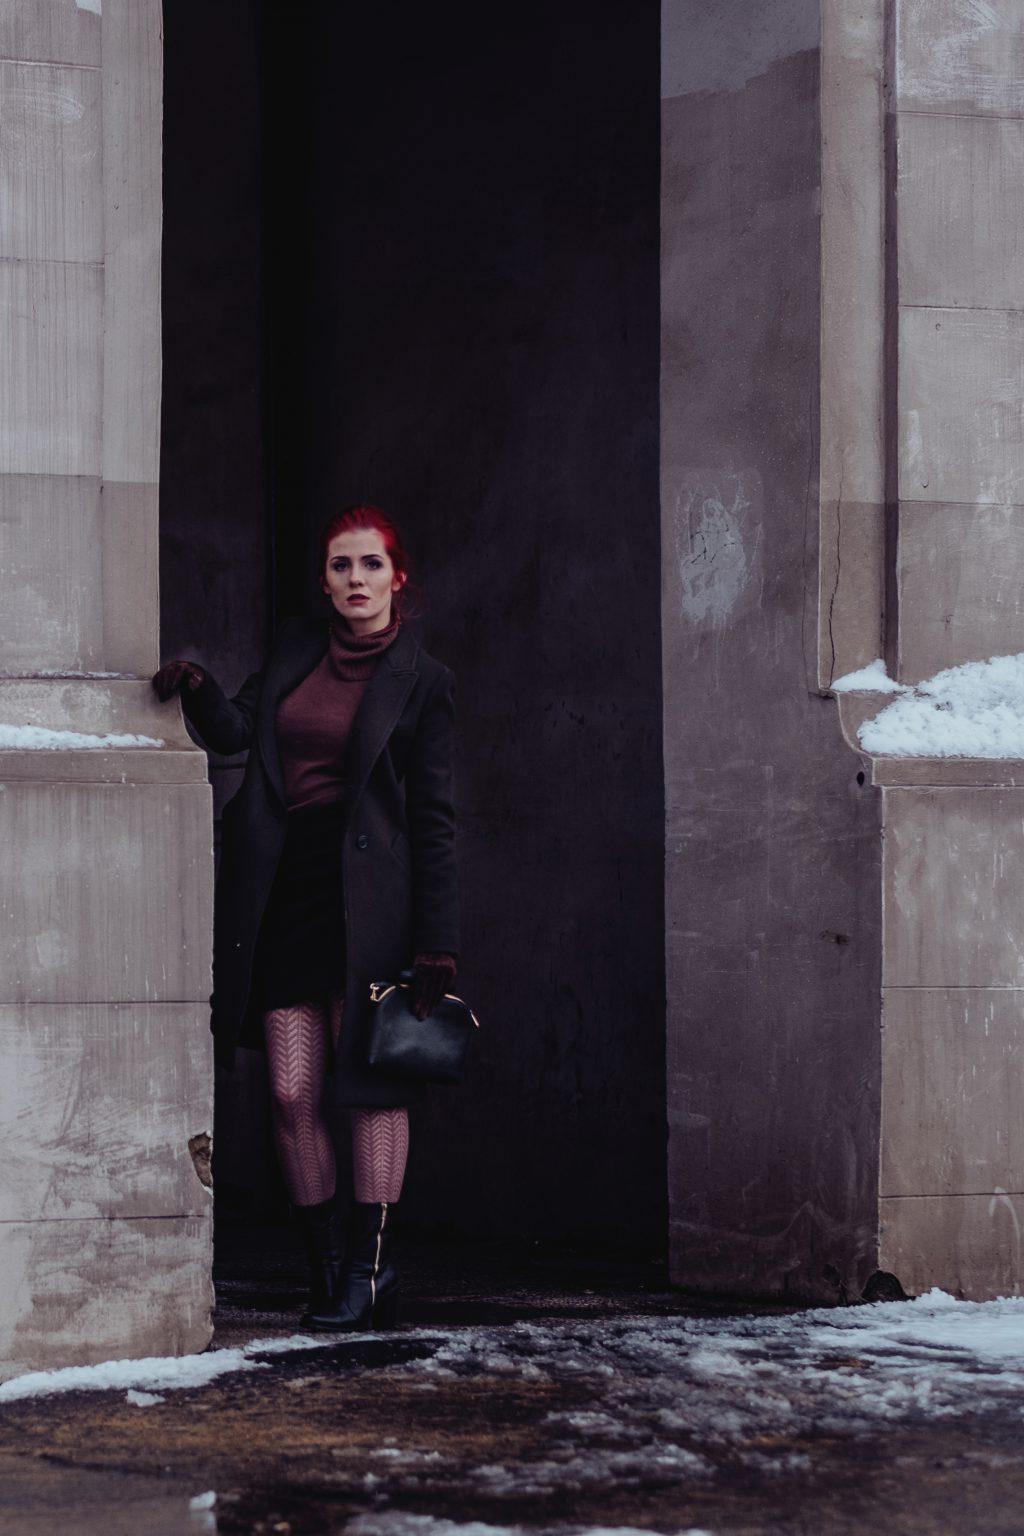 Redhead model winter shoot 3 - free stock photo